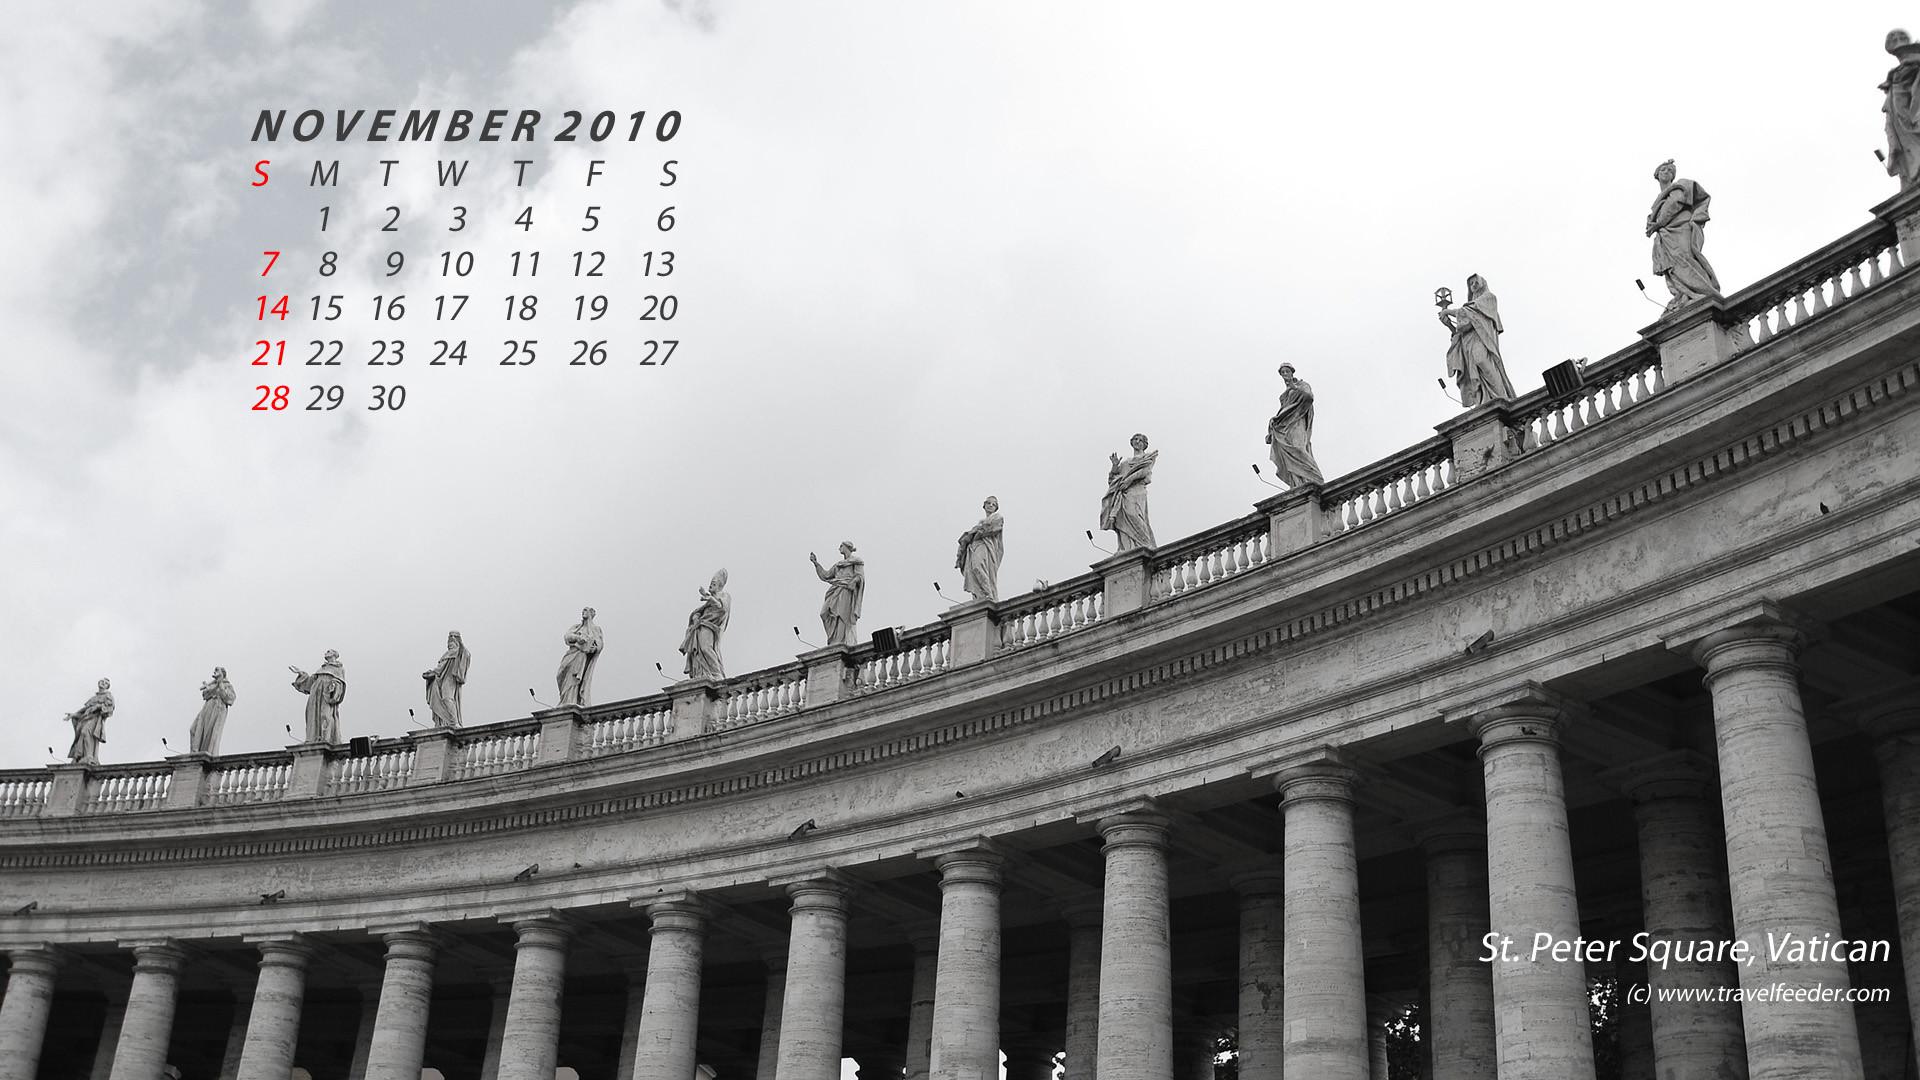 Res: 1920x1080, Vatican Animated November Calendar Photo wallpapers HD 151360